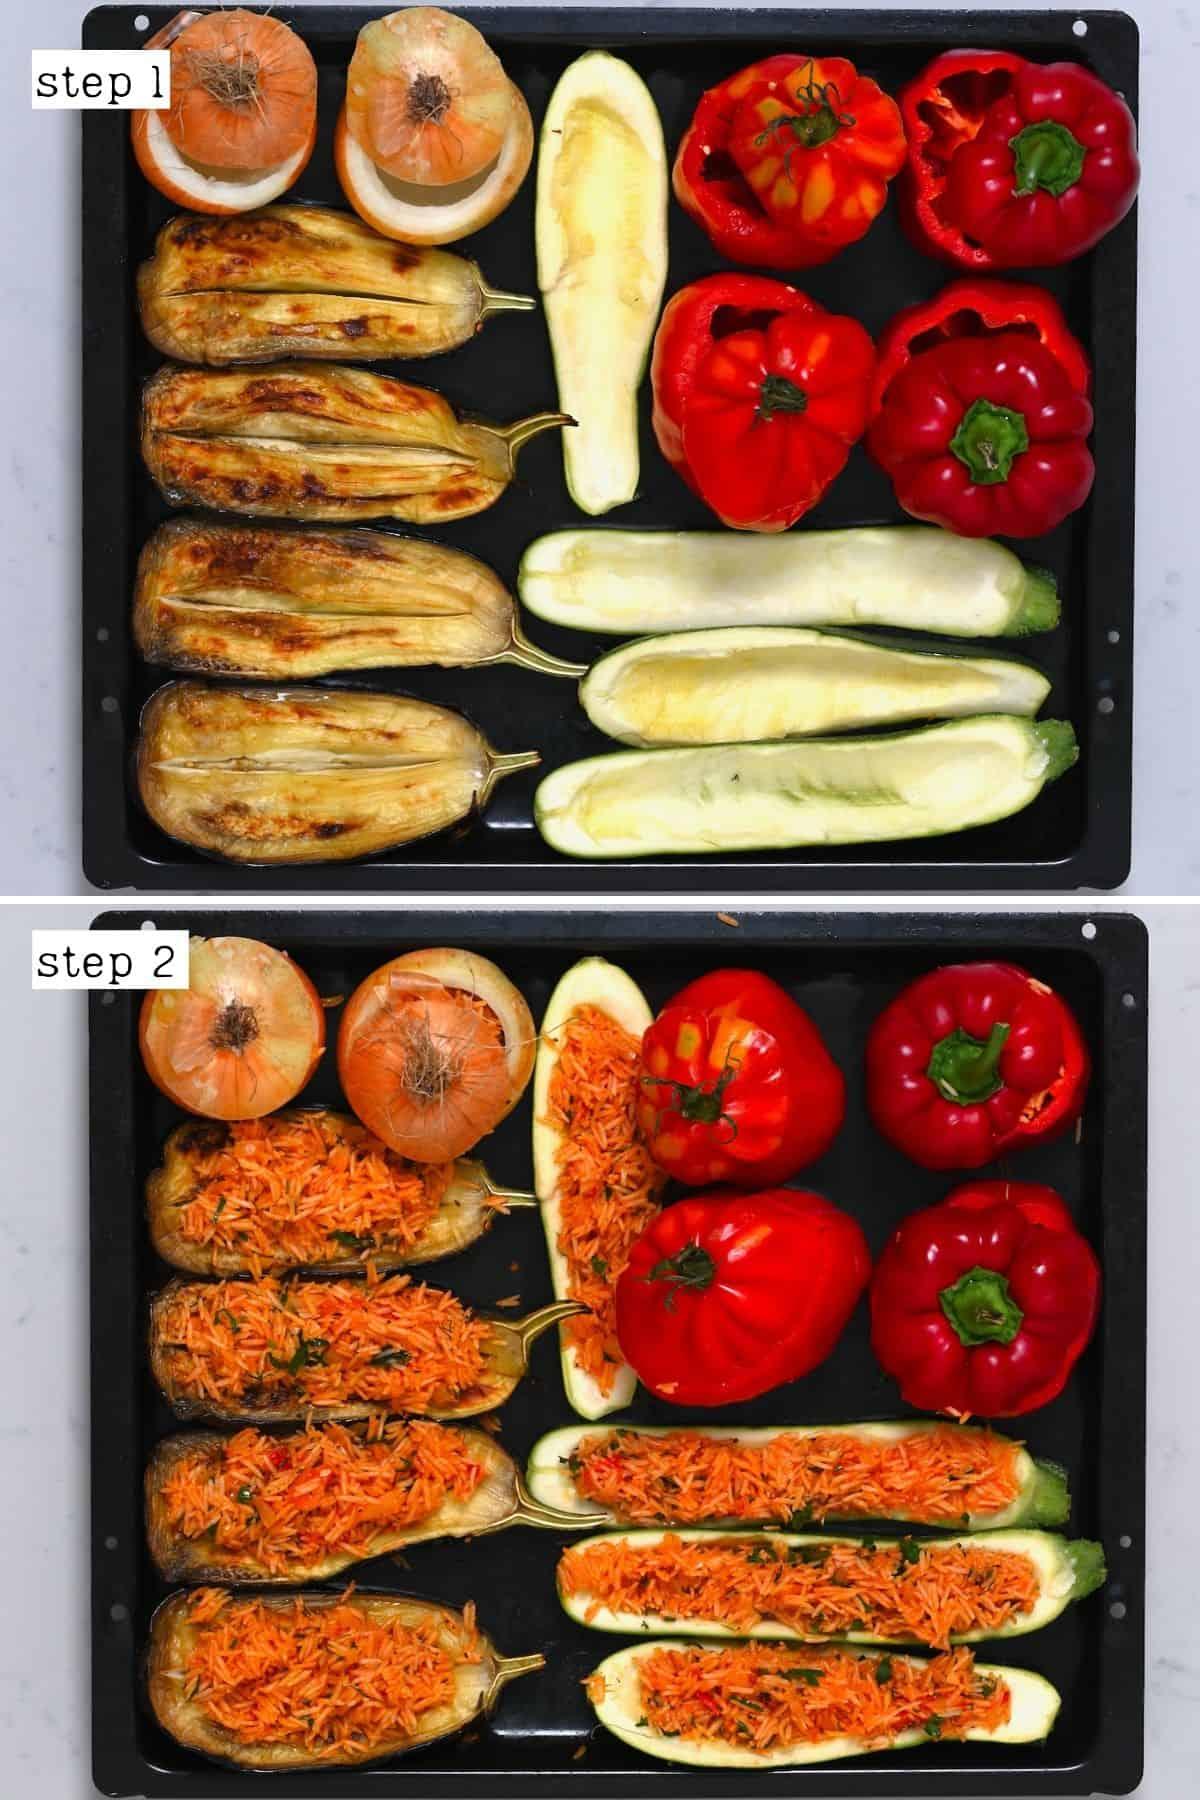 Preparing stuffed veggies